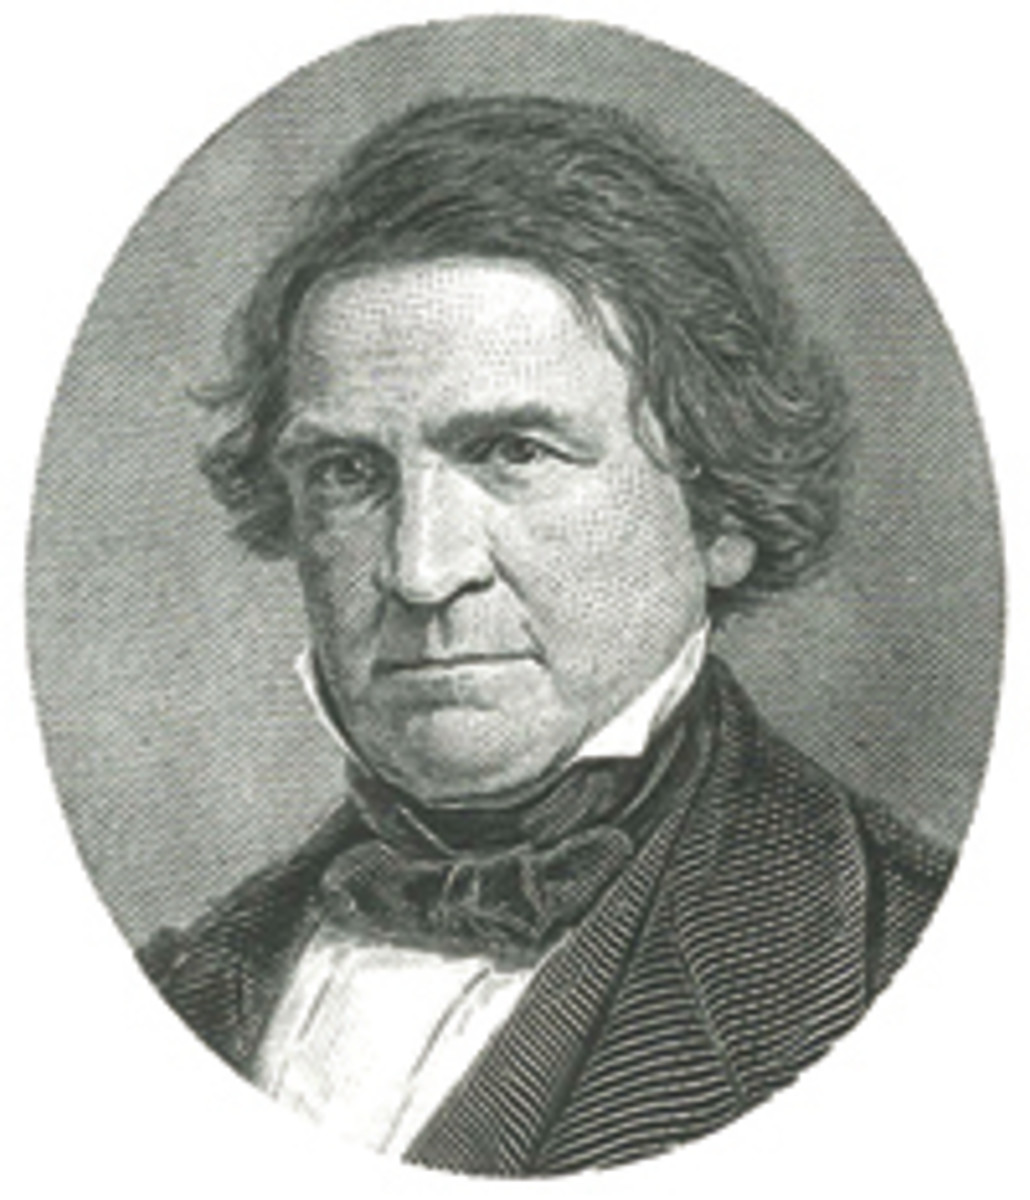 Secretary of War William L. Marcy